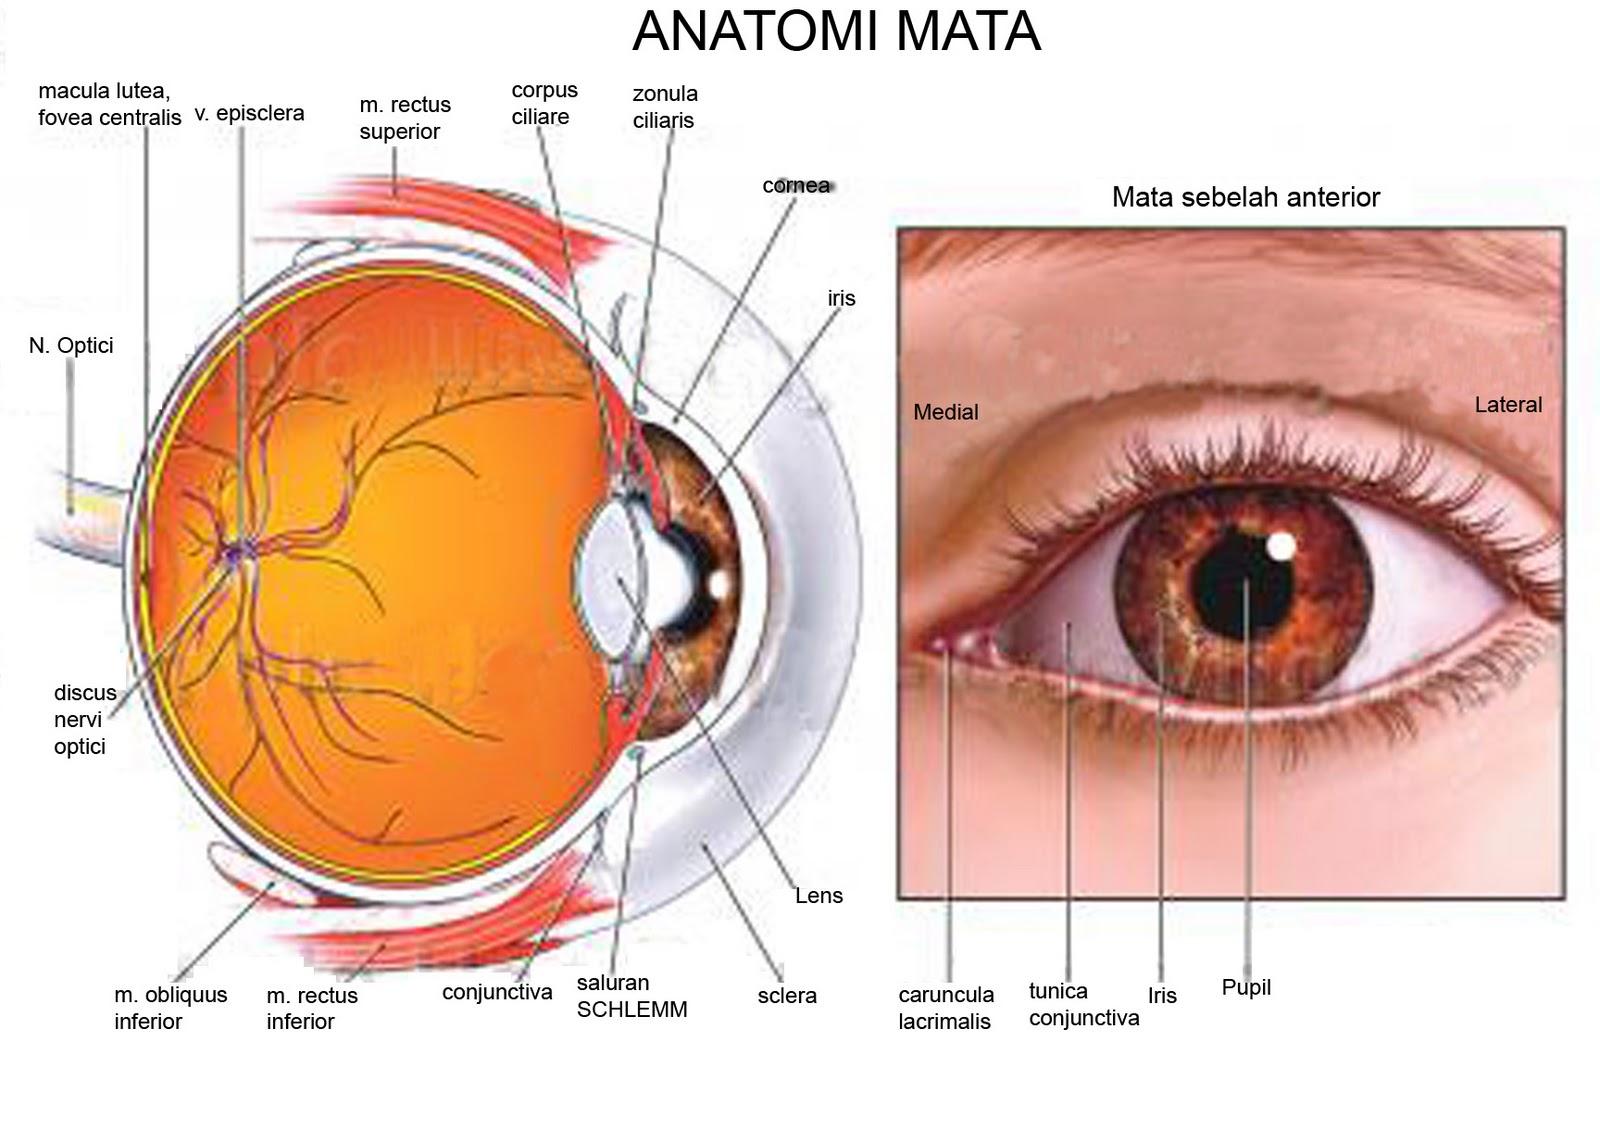 http://1.bp.blogspot.com/-Noe6dtD_KFE/TtPNxQXjarI/AAAAAAAAALM/b9AHbL5C3ds/s1600/anatomi+mata+1.jpg